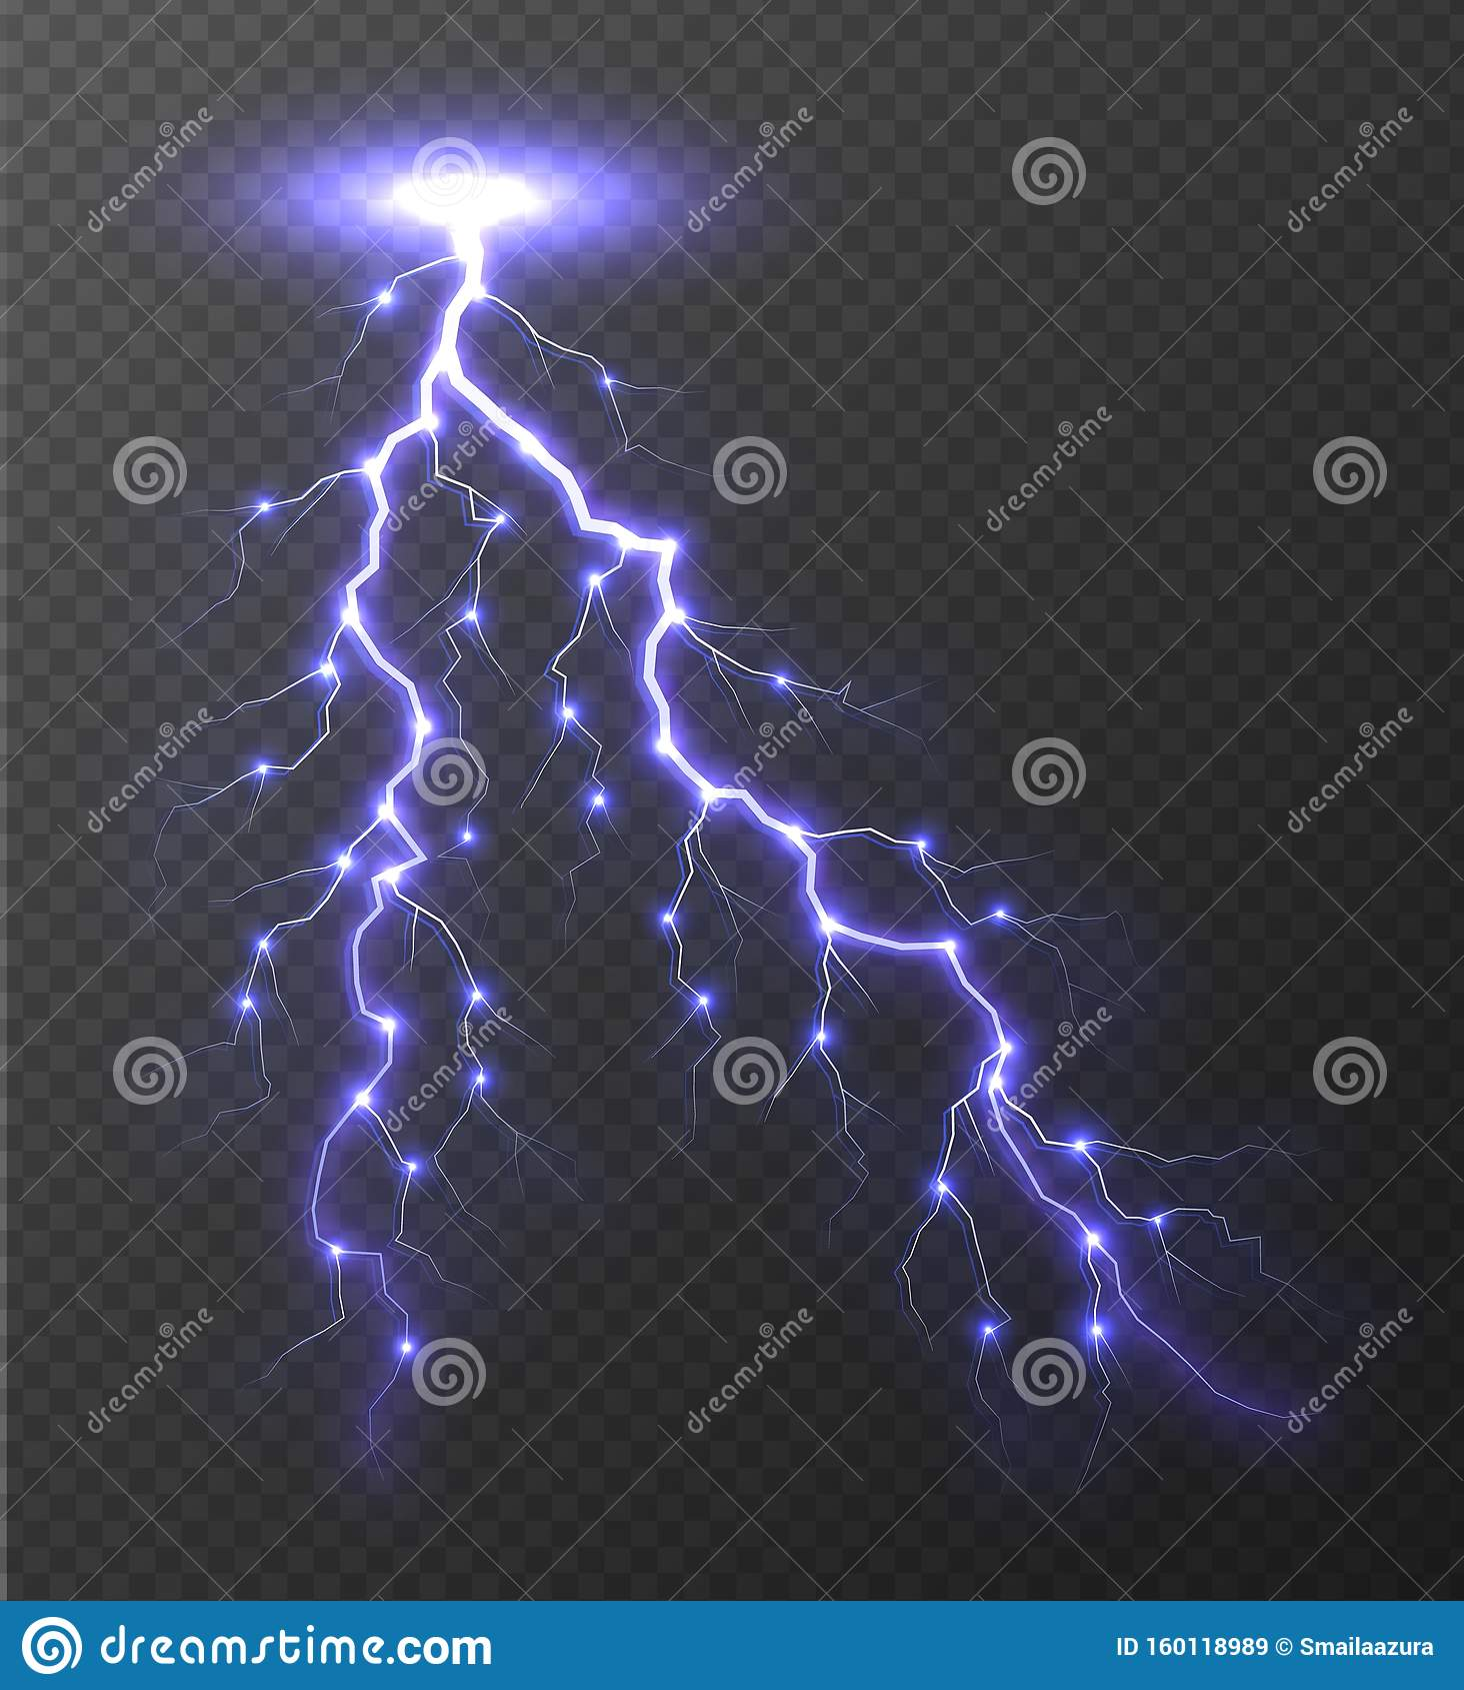 Realistic Lightning Bolt Isolated On Transparent Background Stock Vector Illustration Of Effect Light 160118989